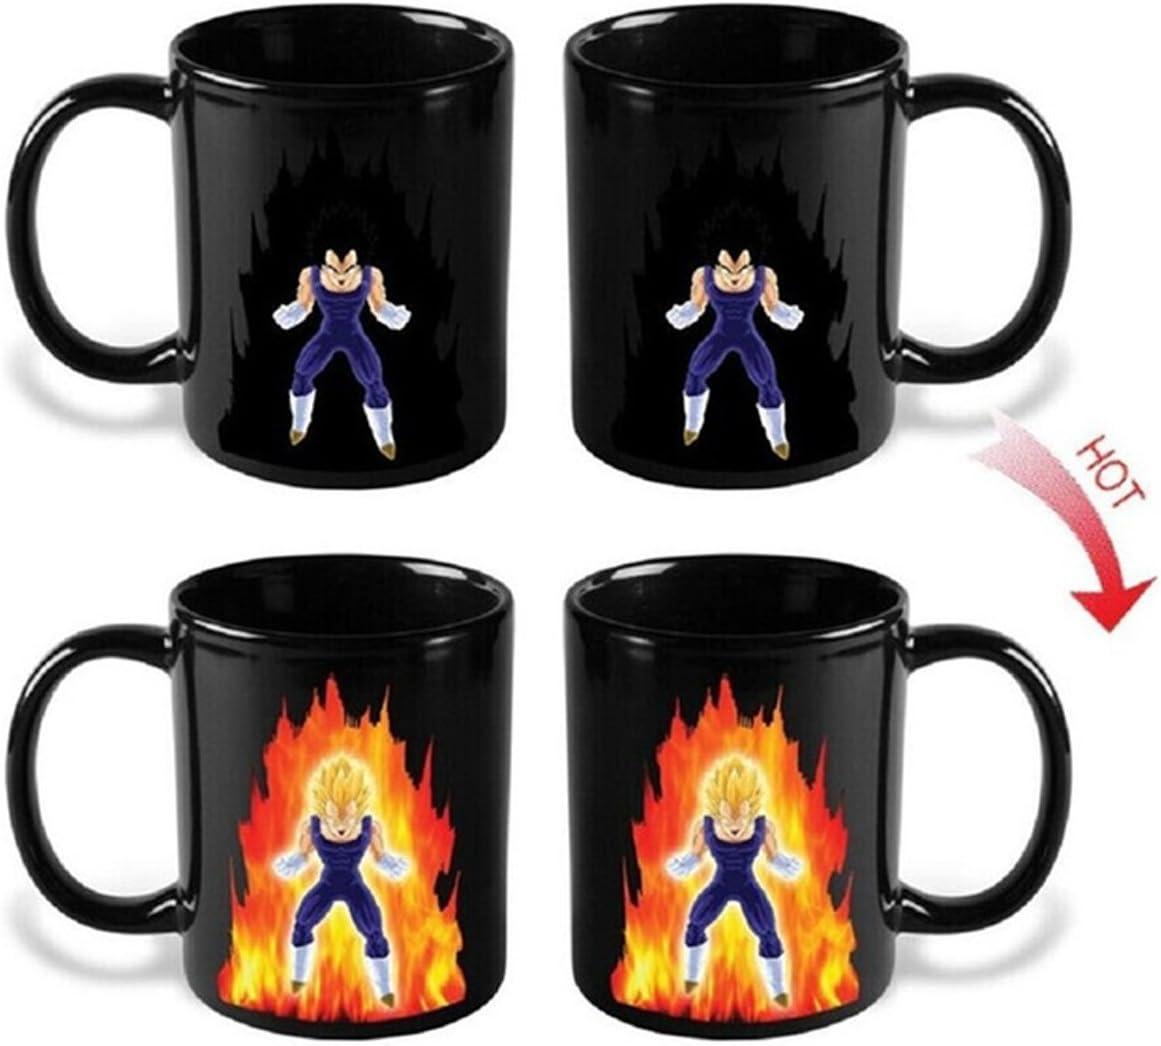 Heat Reactive Vegeta-Inspired Mug by Mugmug